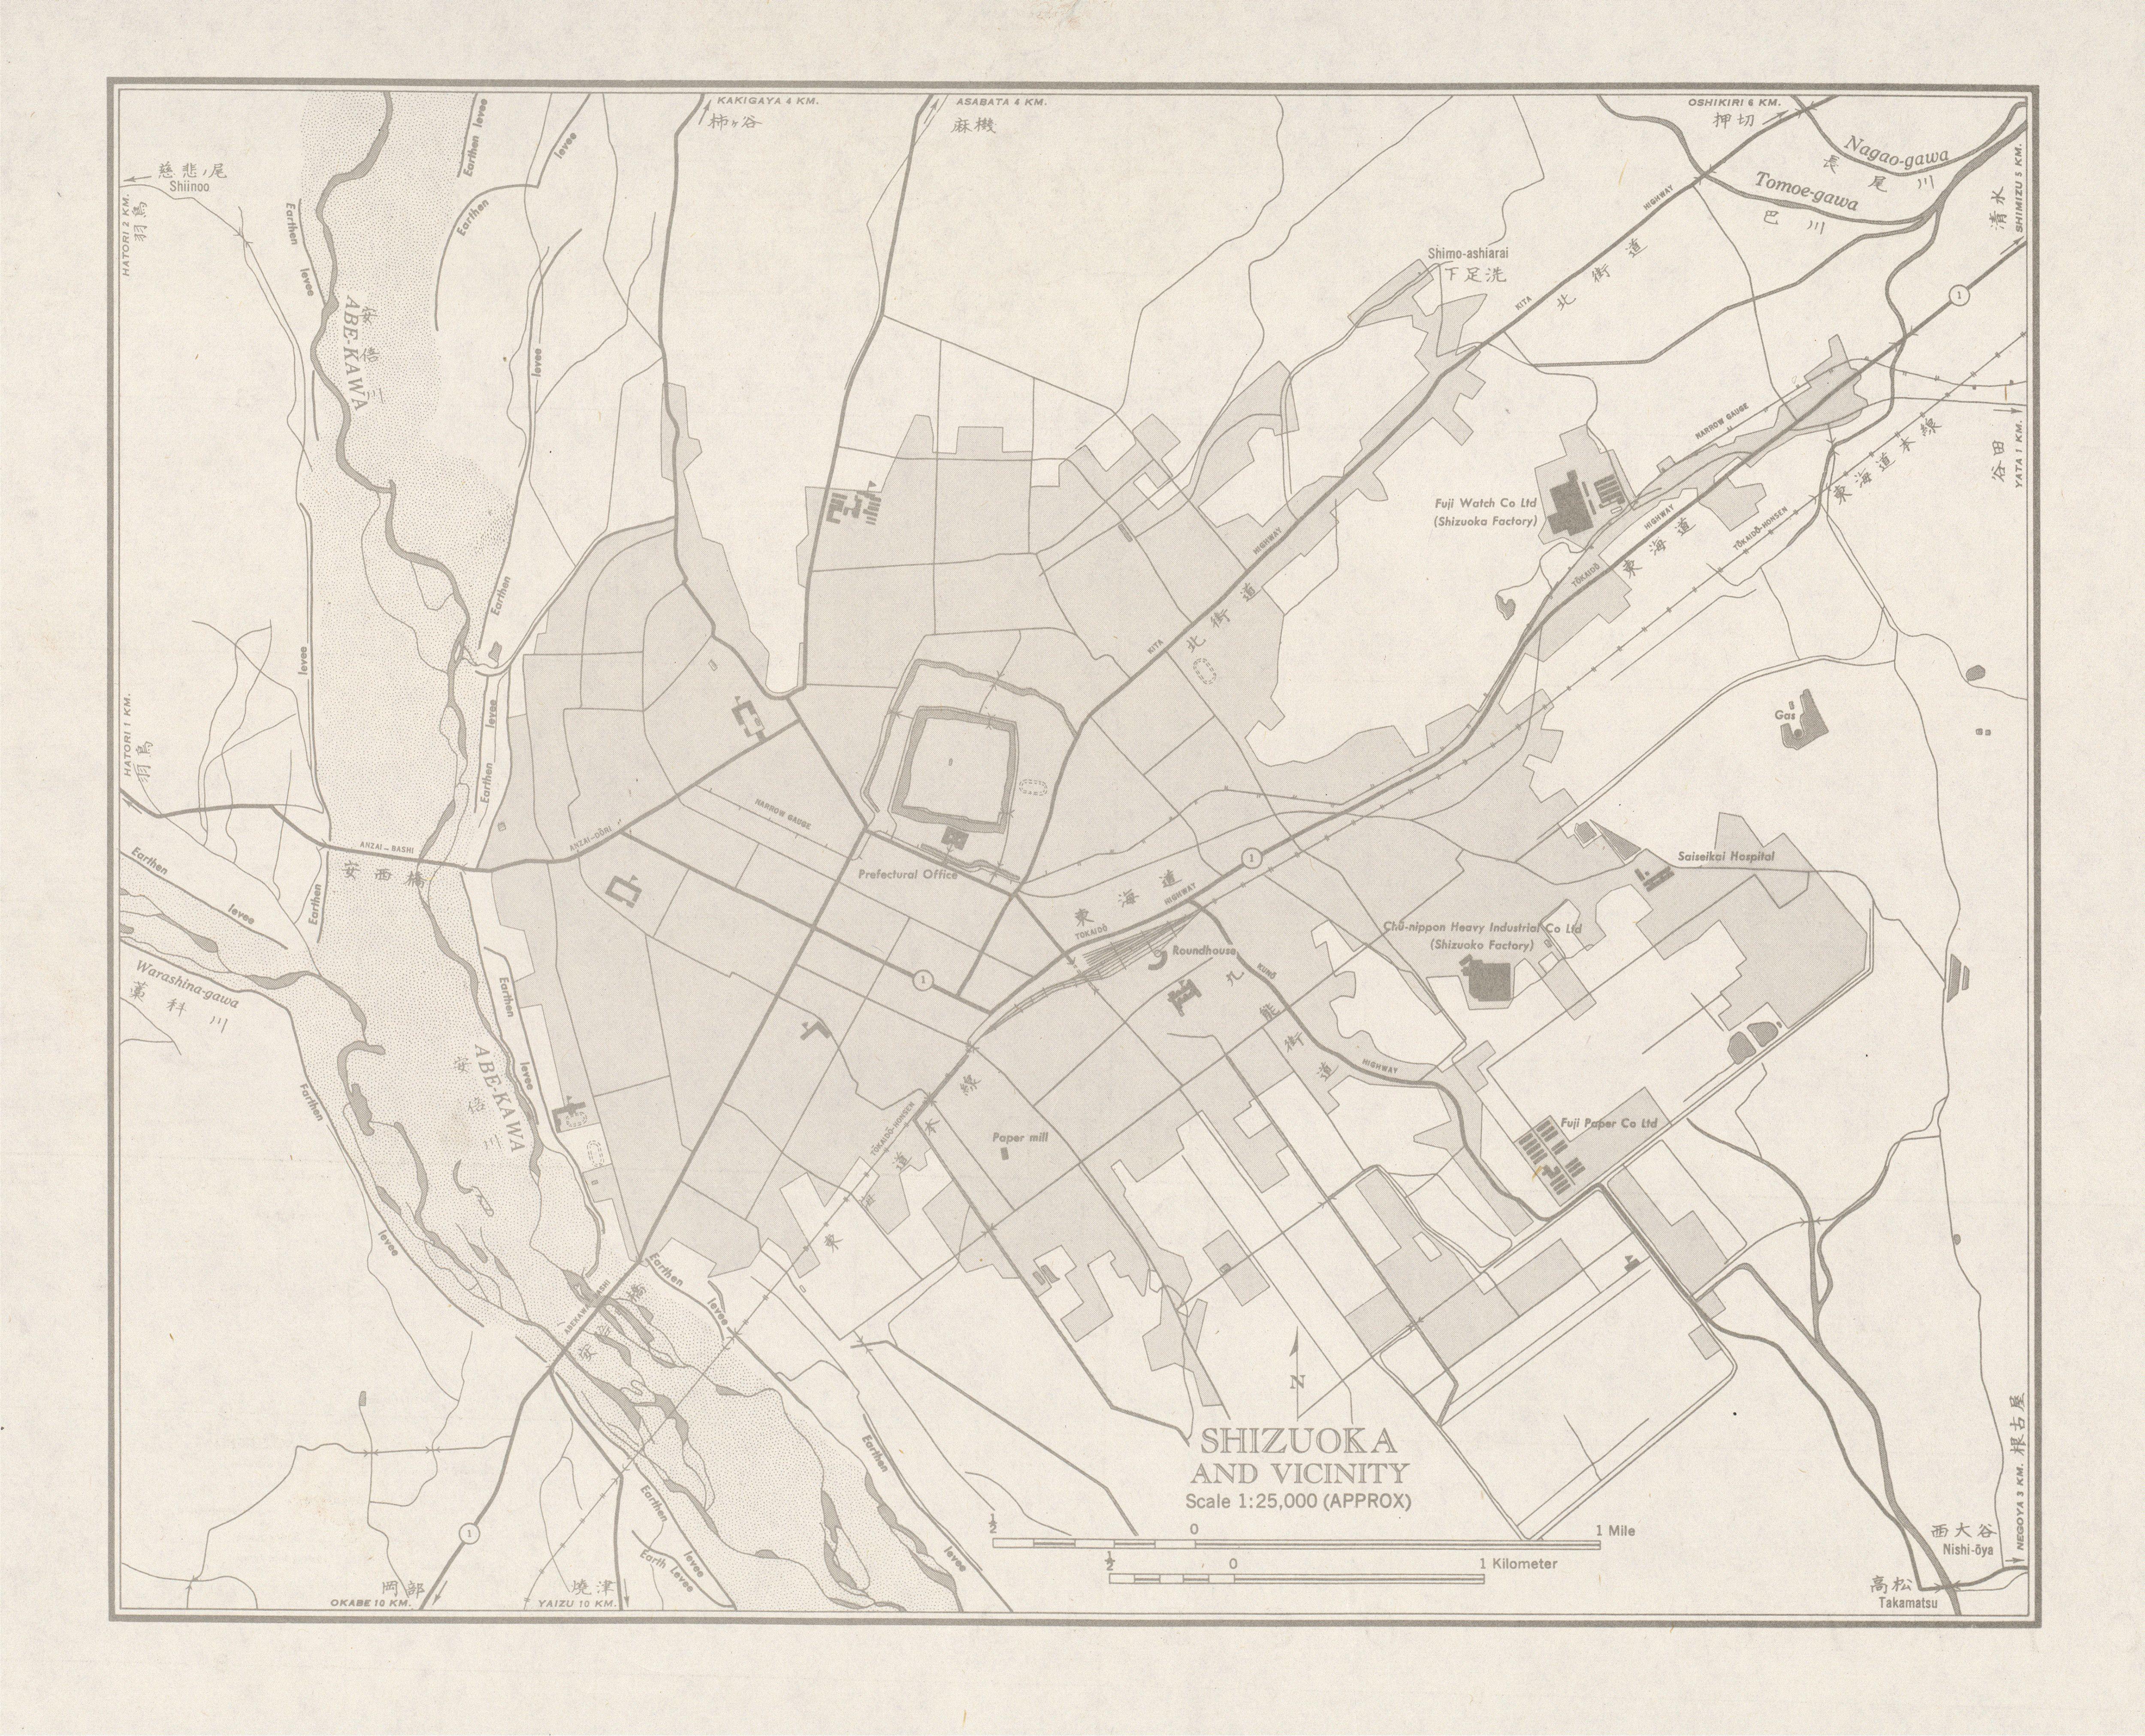 Map of Shizuoka and Vicinity, Japan 1954